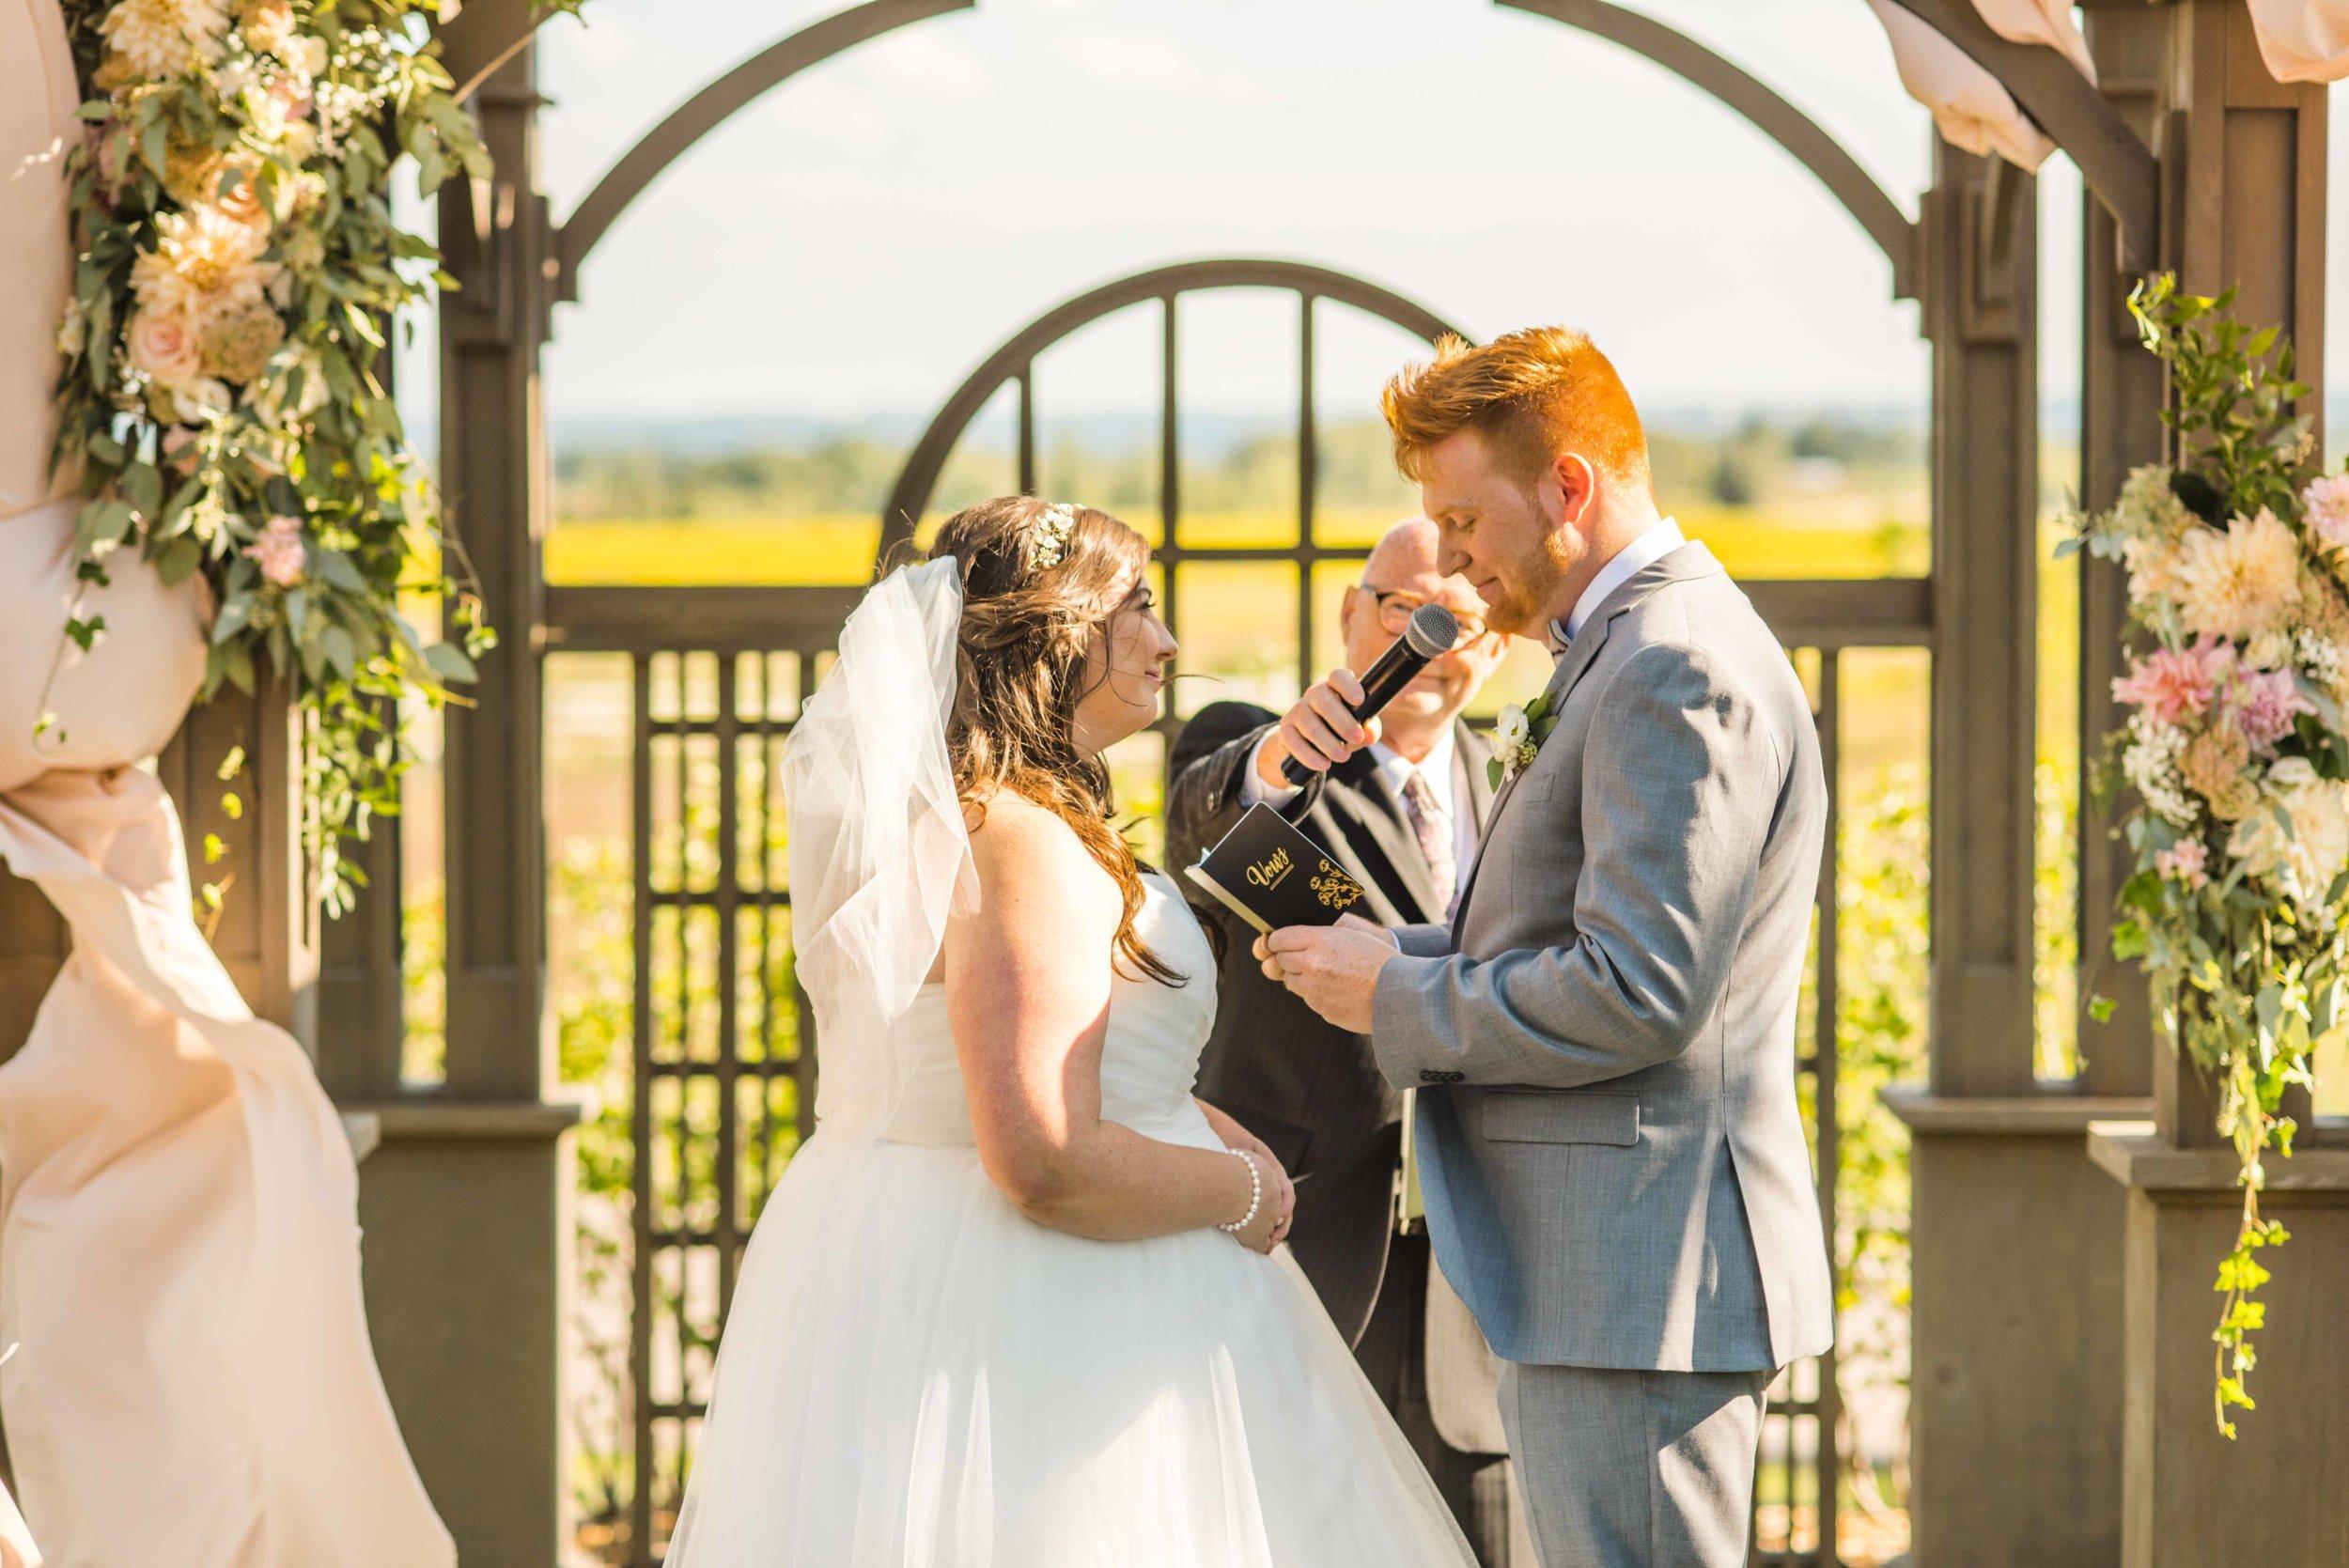 180831 JamesLaura_Wedding_Express-585.jpg